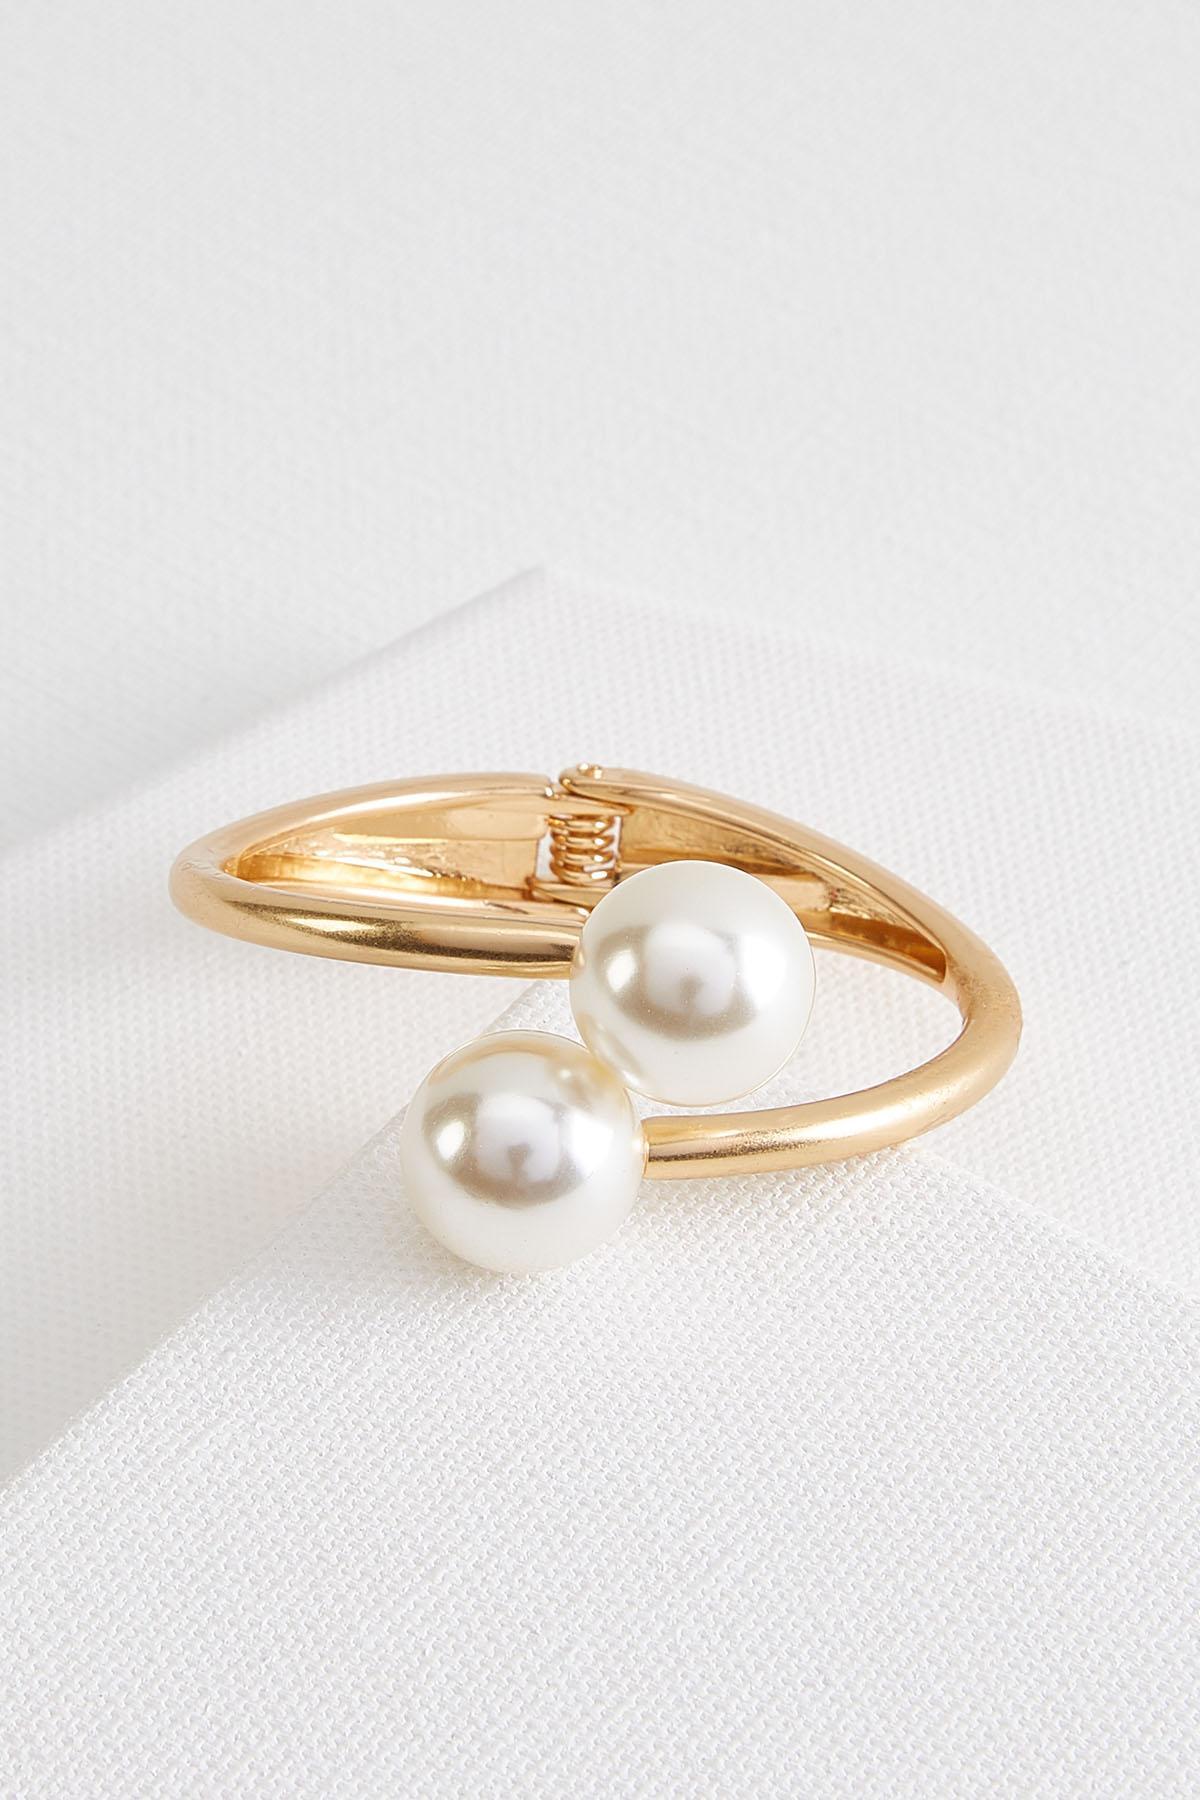 Mod Pearl Cuff Bracelet